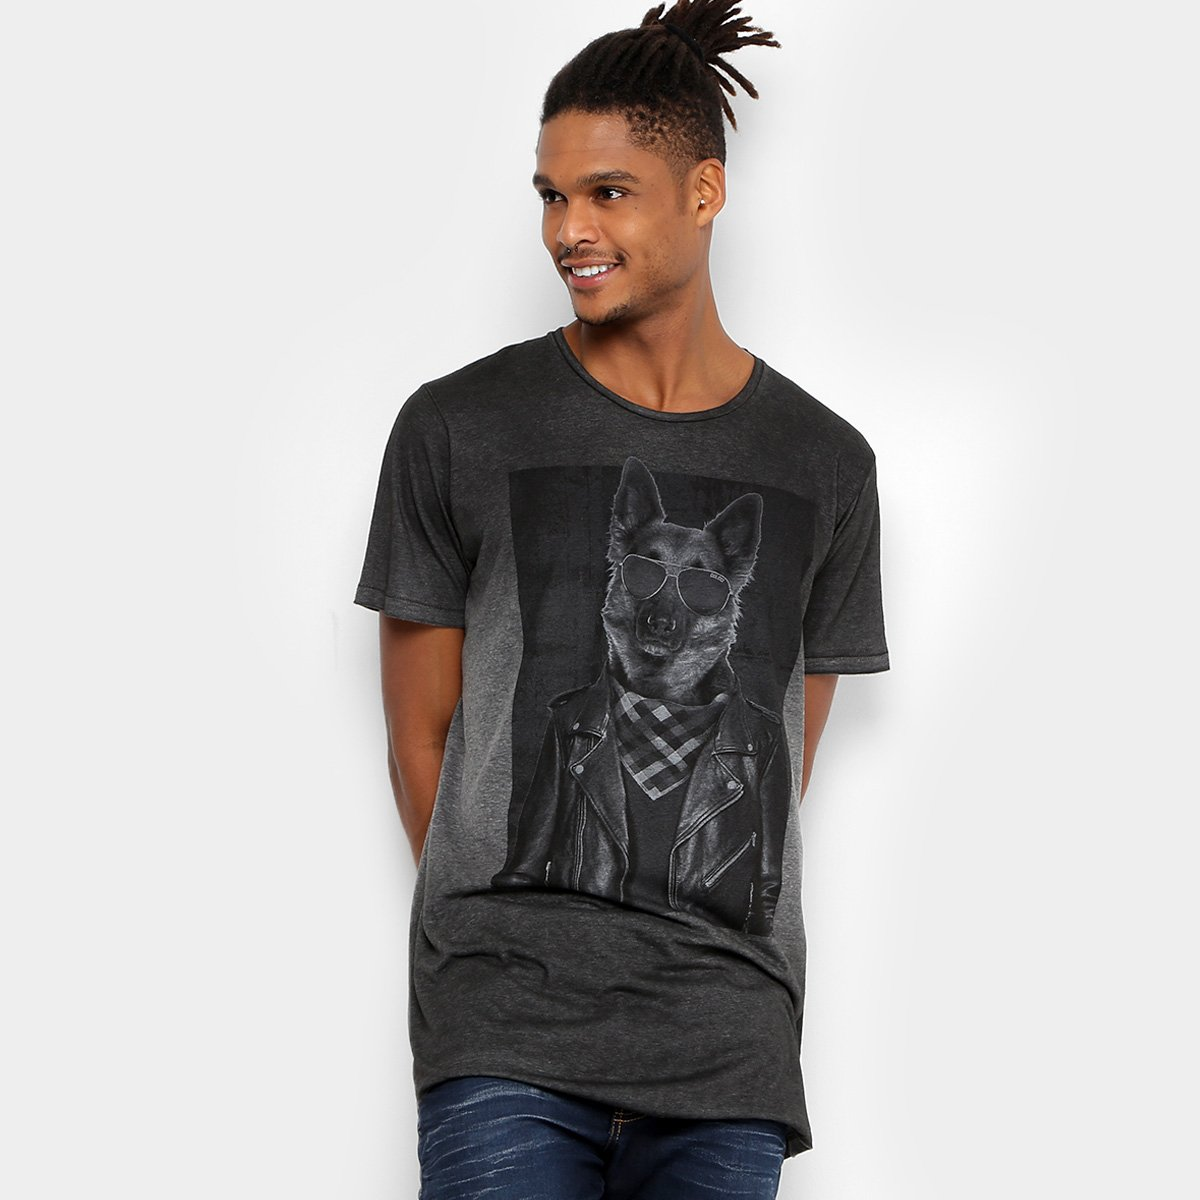 cad5086643a54 48%OFF Camiseta Colcci Oversized Estampada Masculina